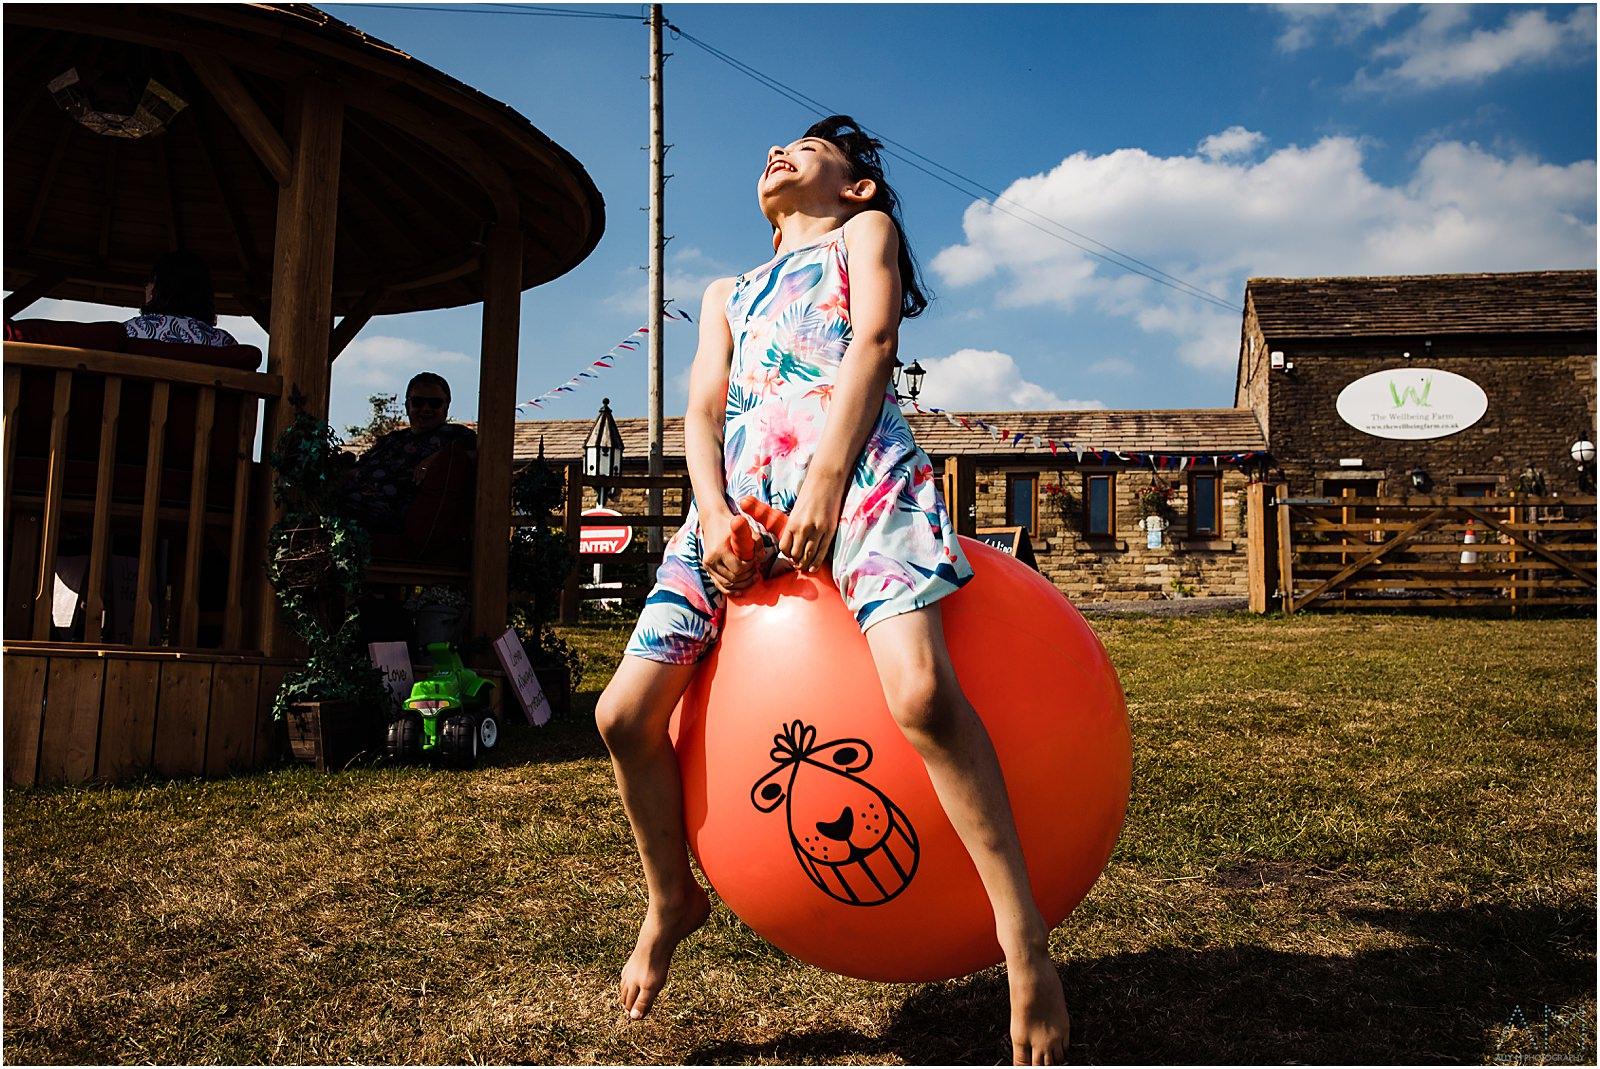 Girl bouncing on space hopper